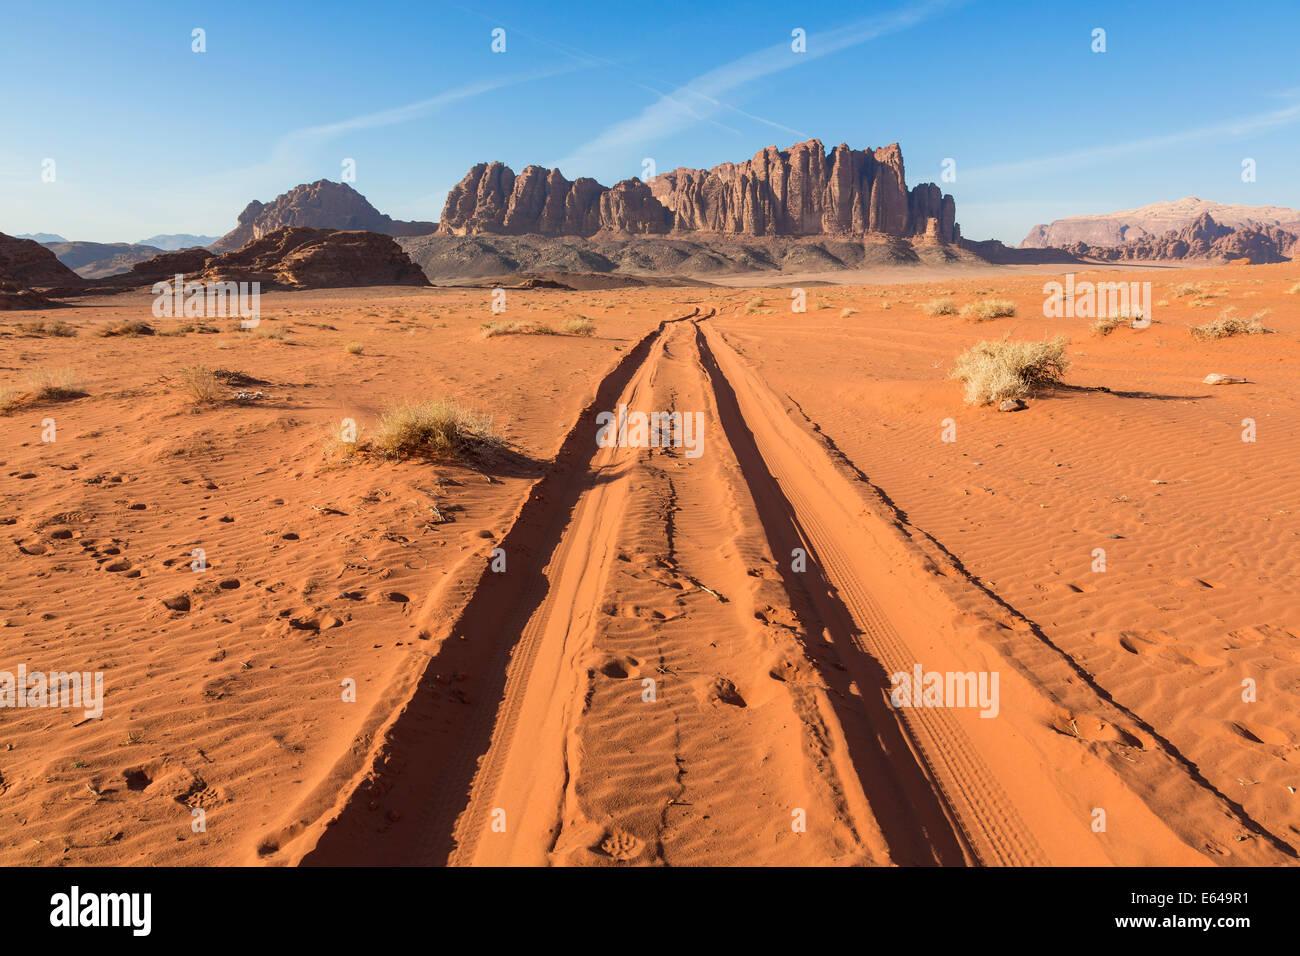 Tracks in the desert, Wadi Rum, Jordan Stock Photo